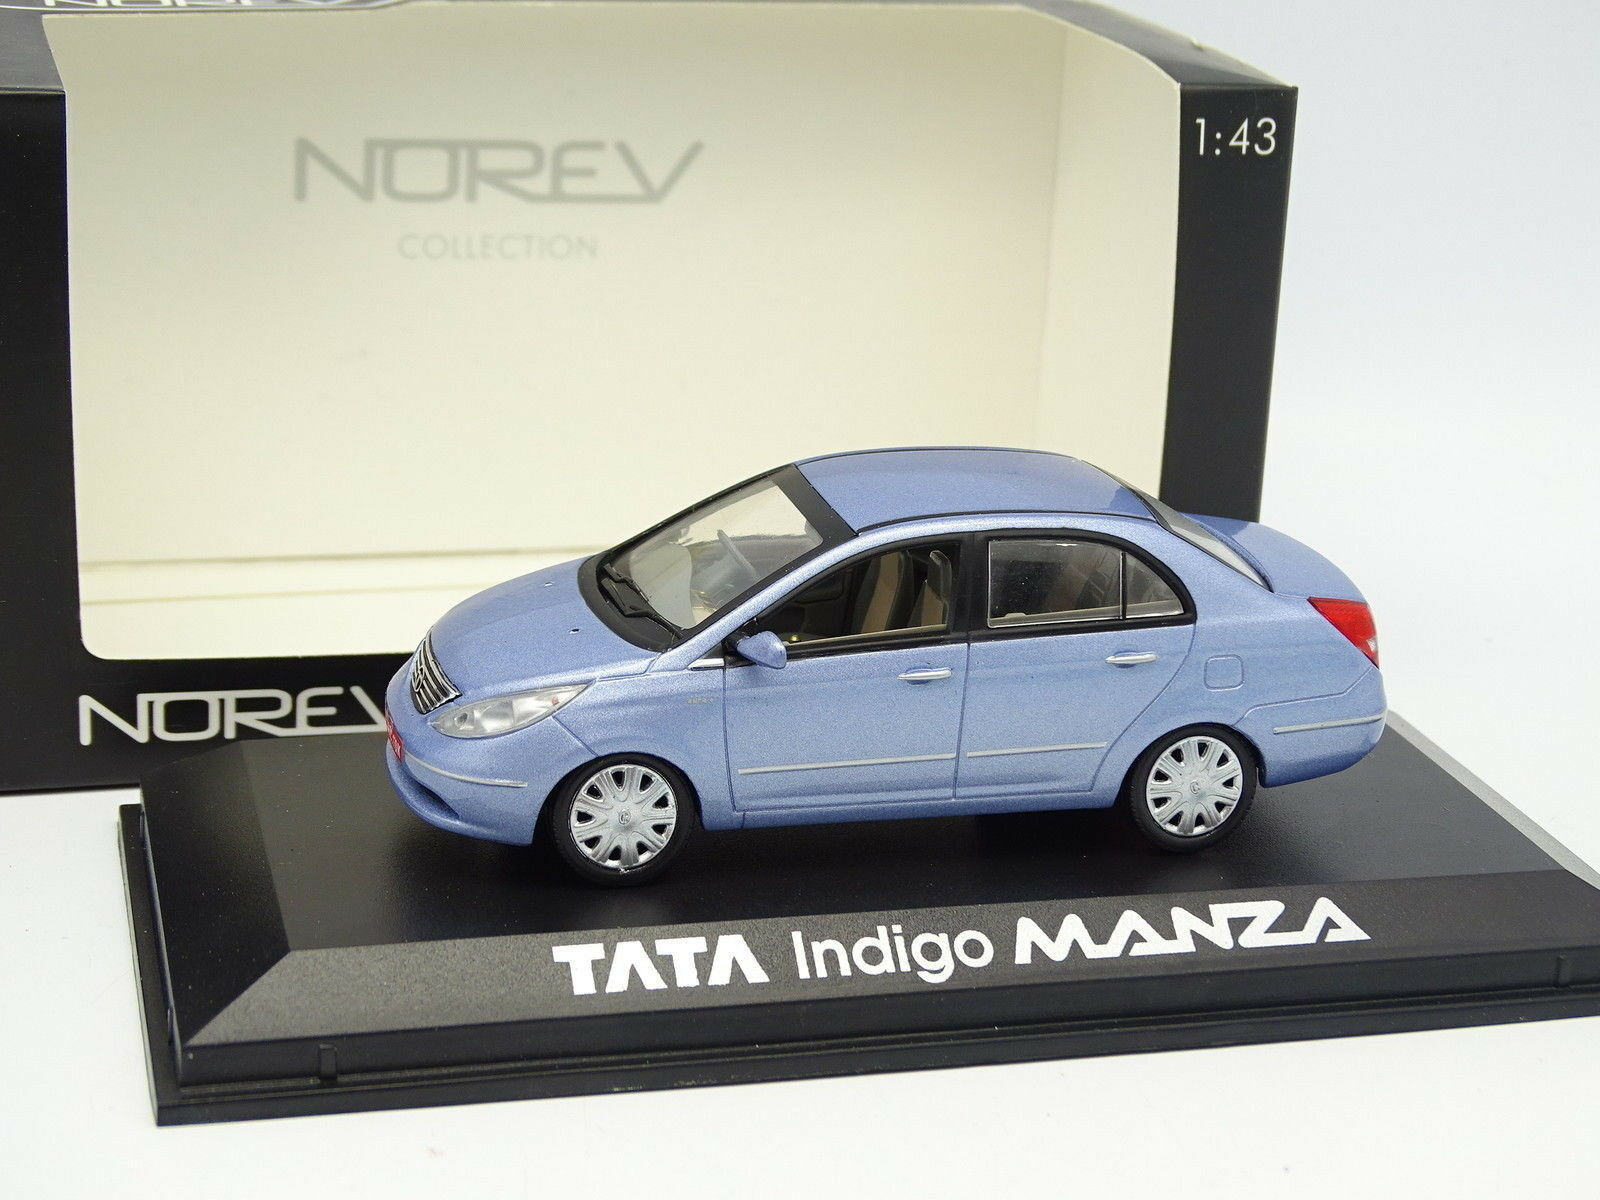 Norev 1 43 43 43 - Tata Indigo Manza blue a5b26c